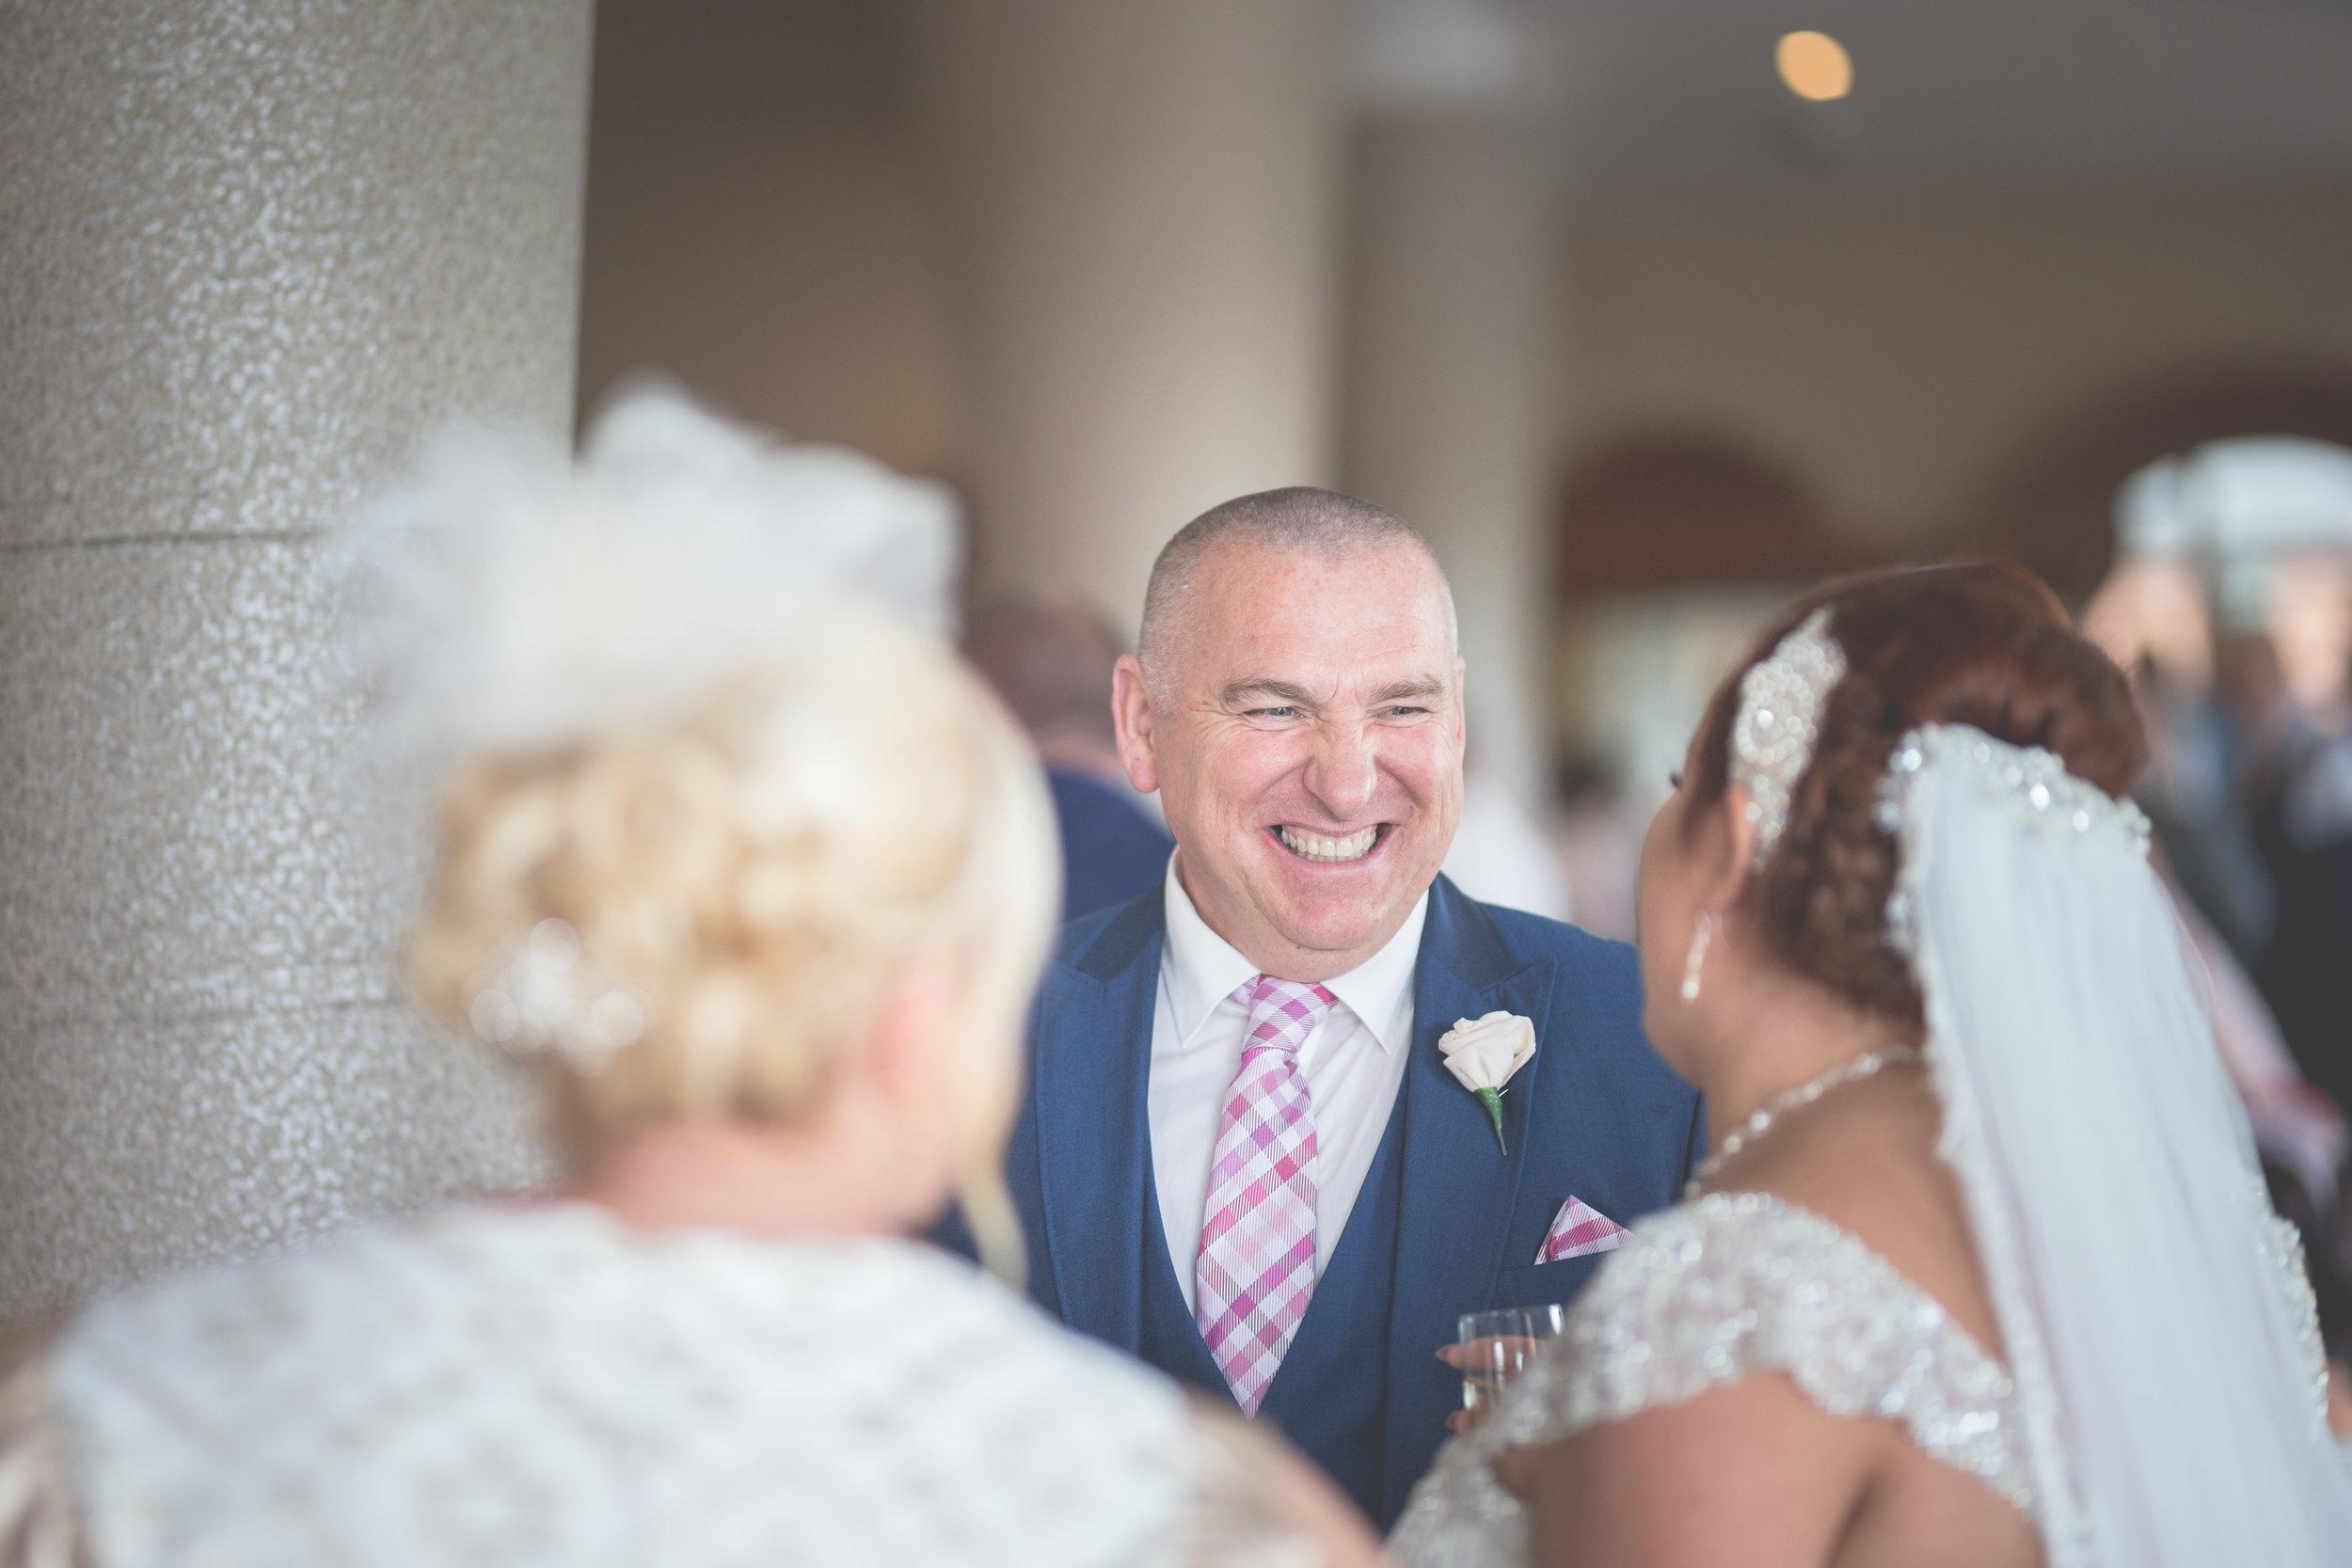 Antoinette & Stephen - Portraits   Brian McEwan Photography   Wedding Photographer Northern Ireland 98.jpg